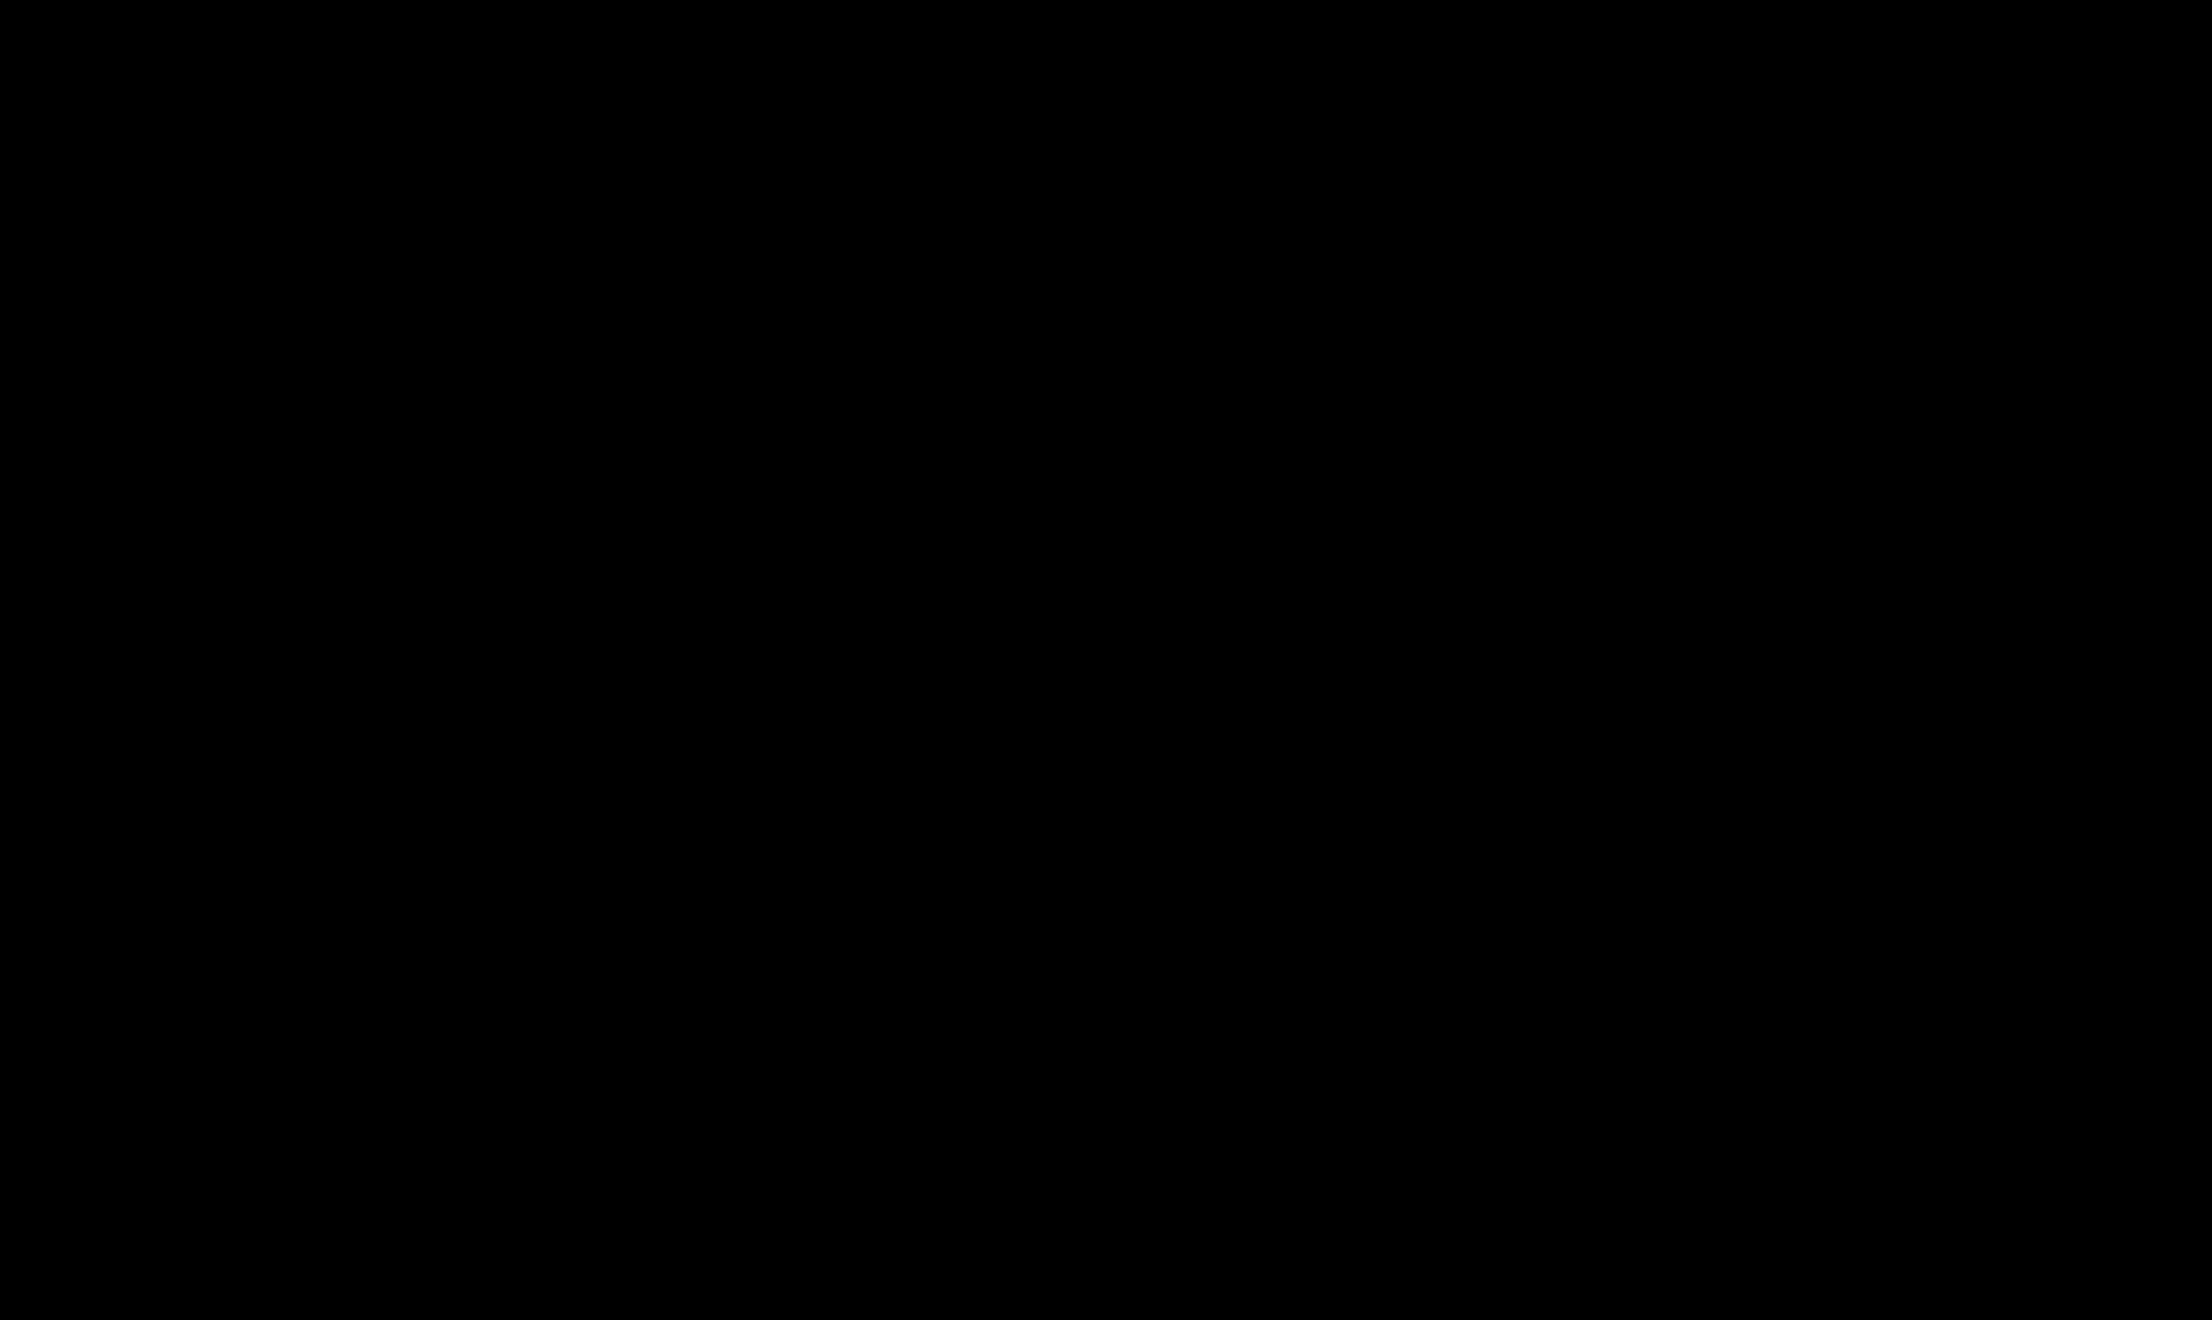 2212x1320 Clipart